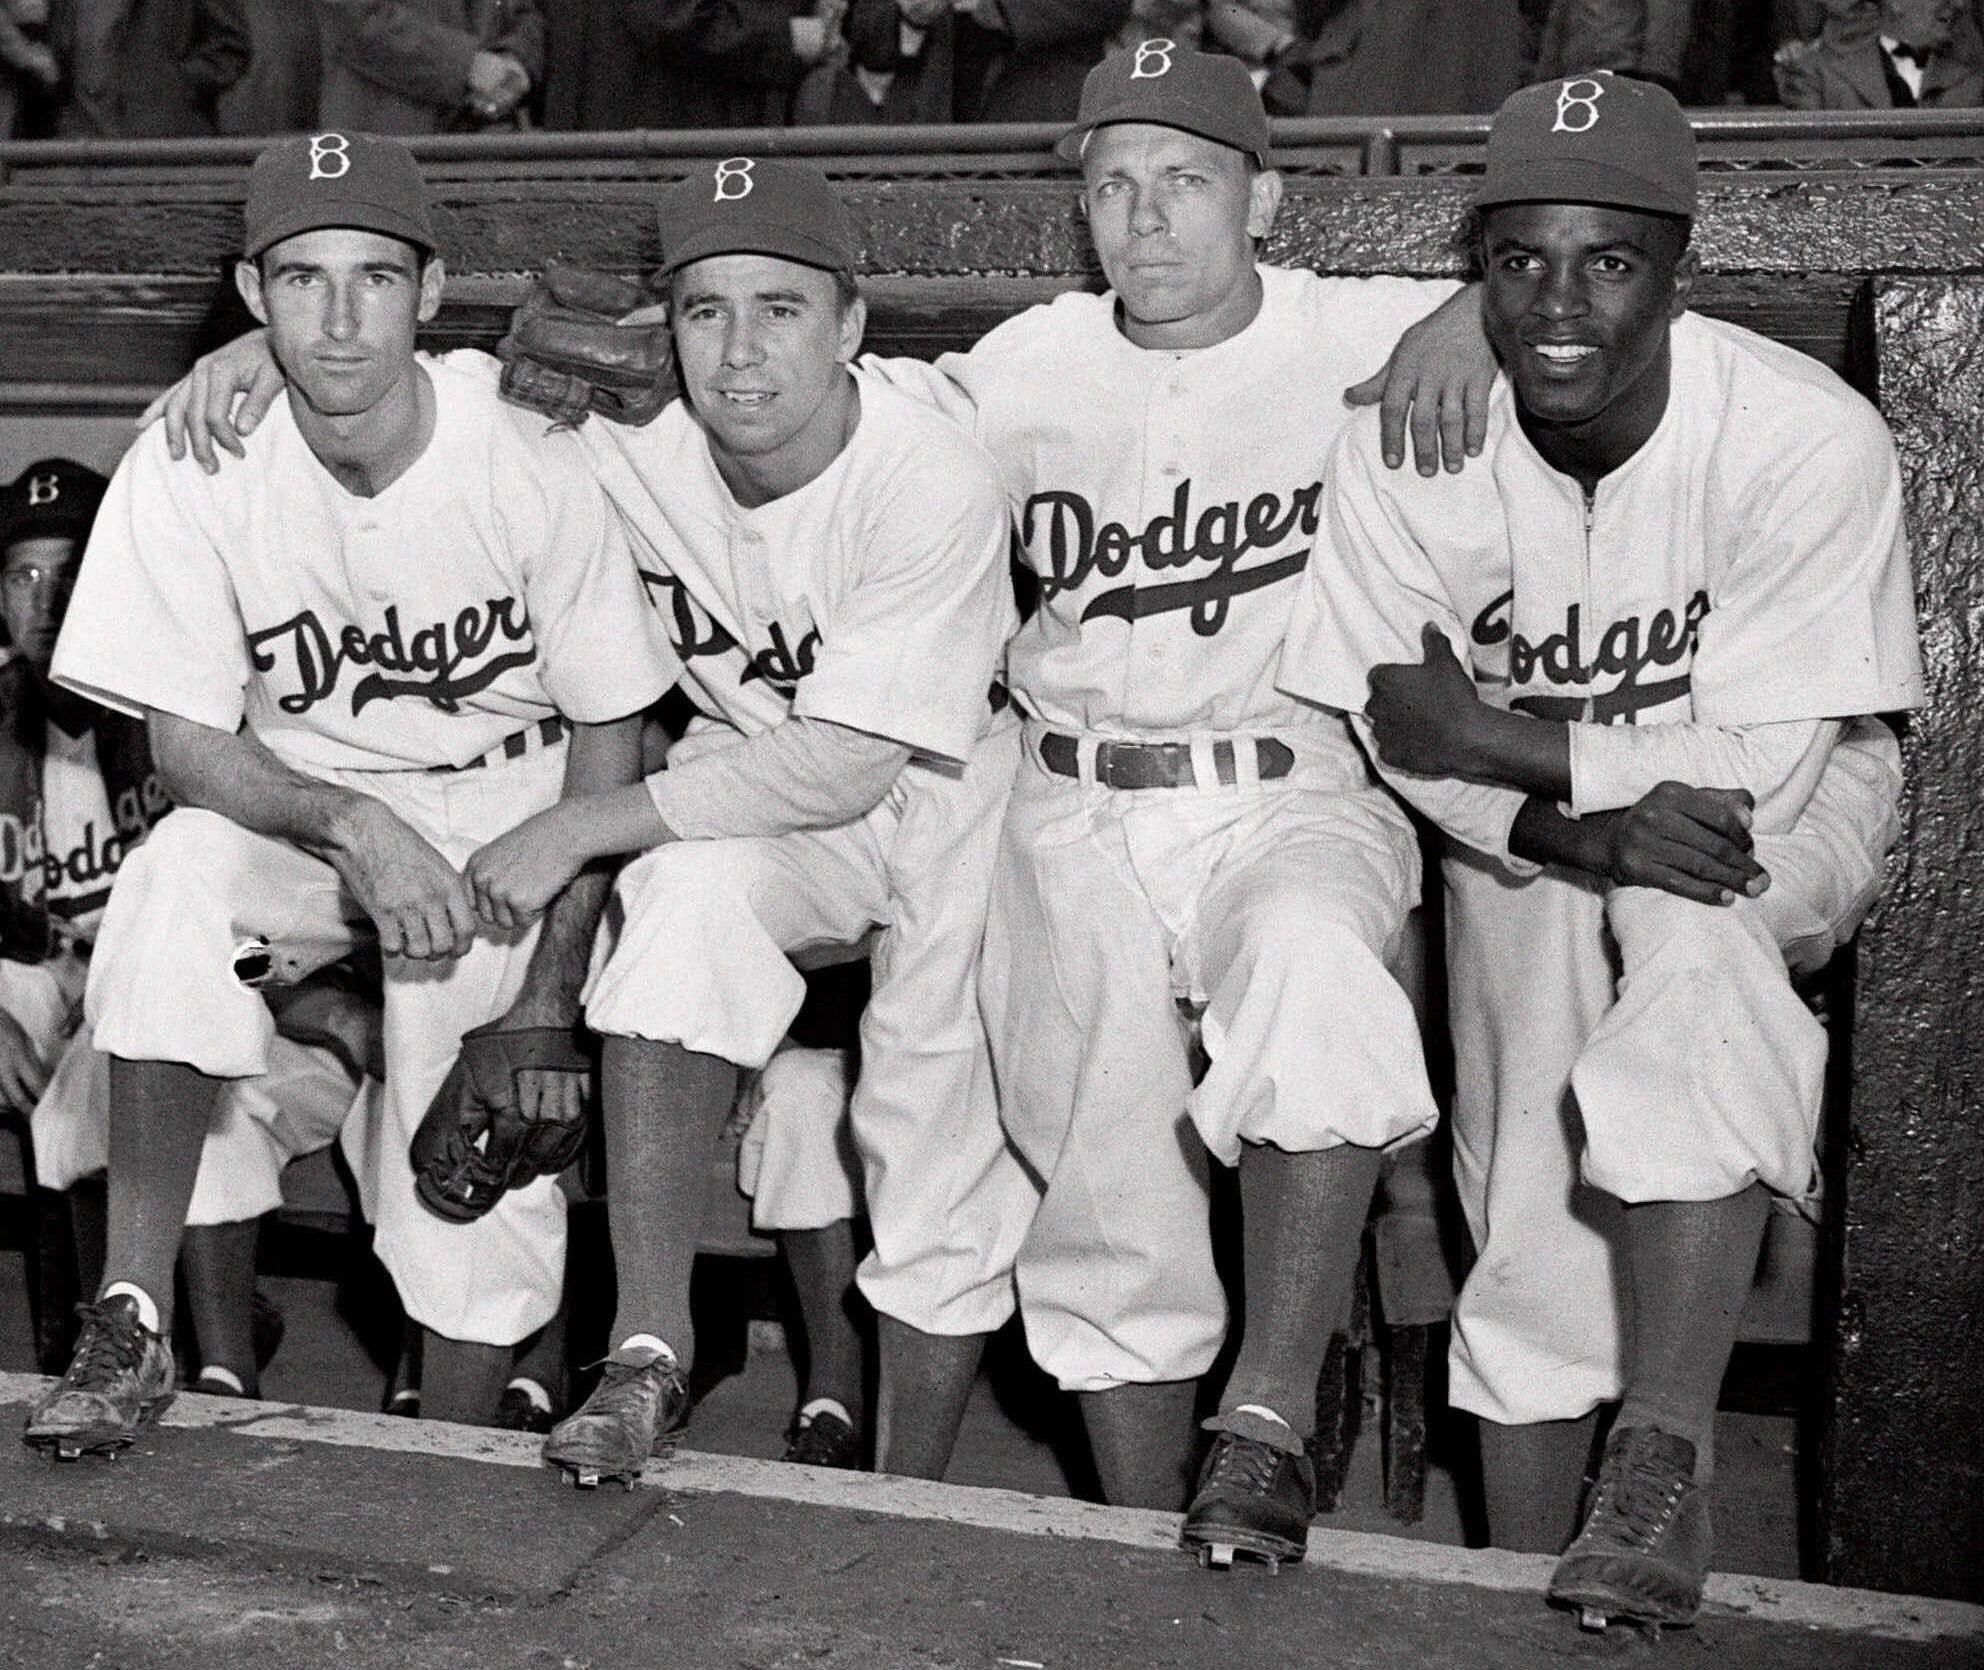 79cb11c75 Brooklyn Dodgers baseball players, from left, John Jorgensen, Pee Wee  Reese, Ed